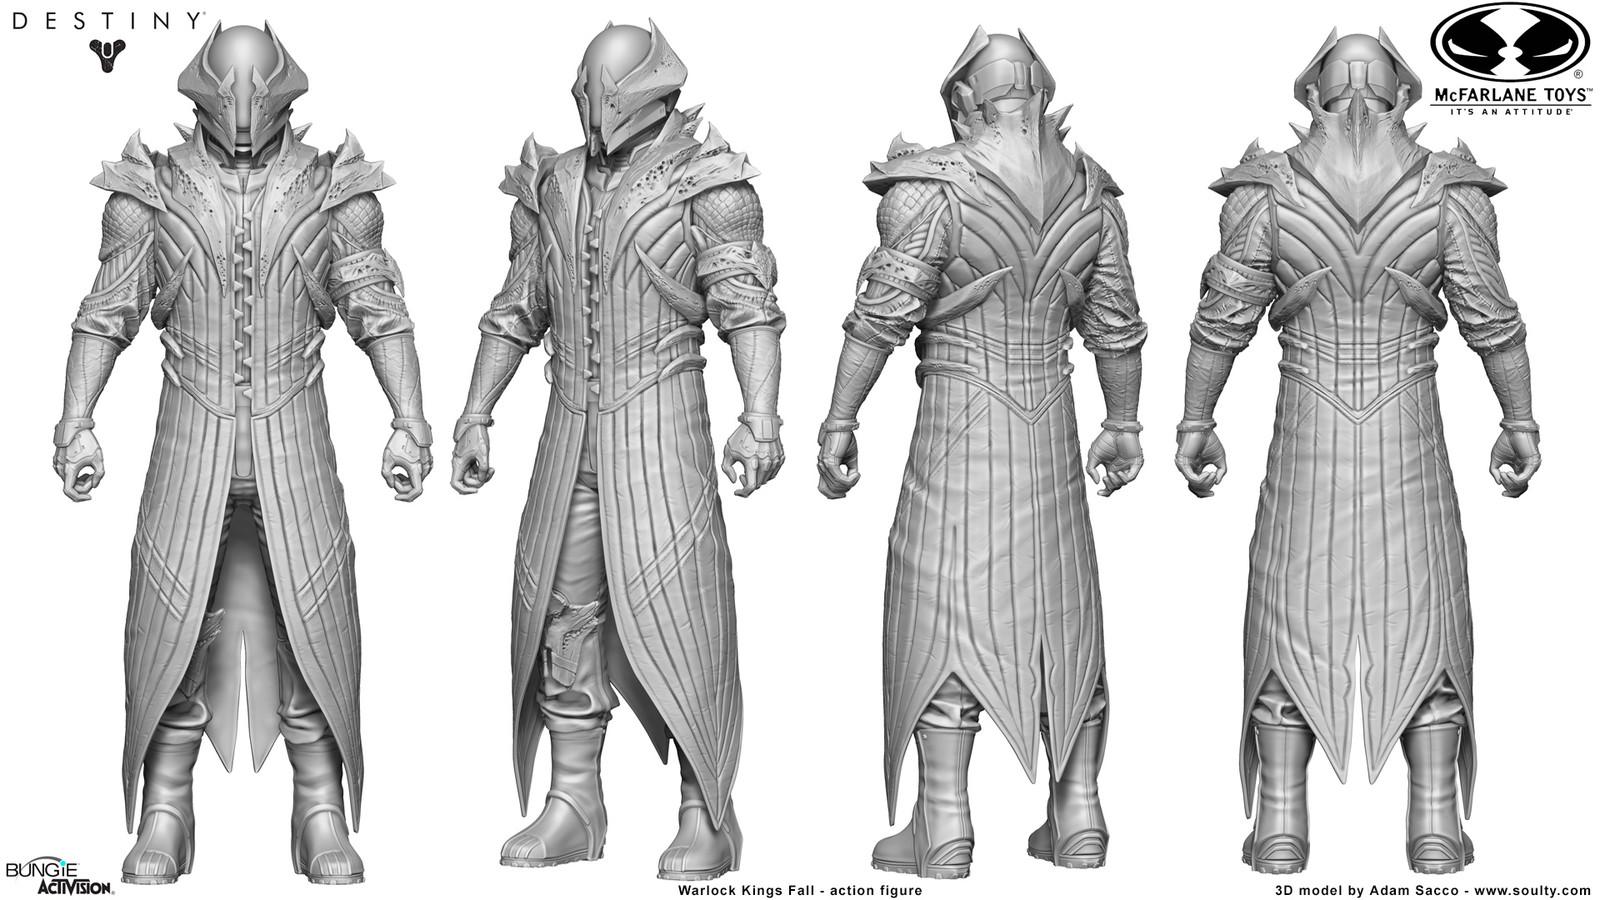 3D Model _ Mcfarlane Toys - Destiny: Warlock Kings Fall - Action figure